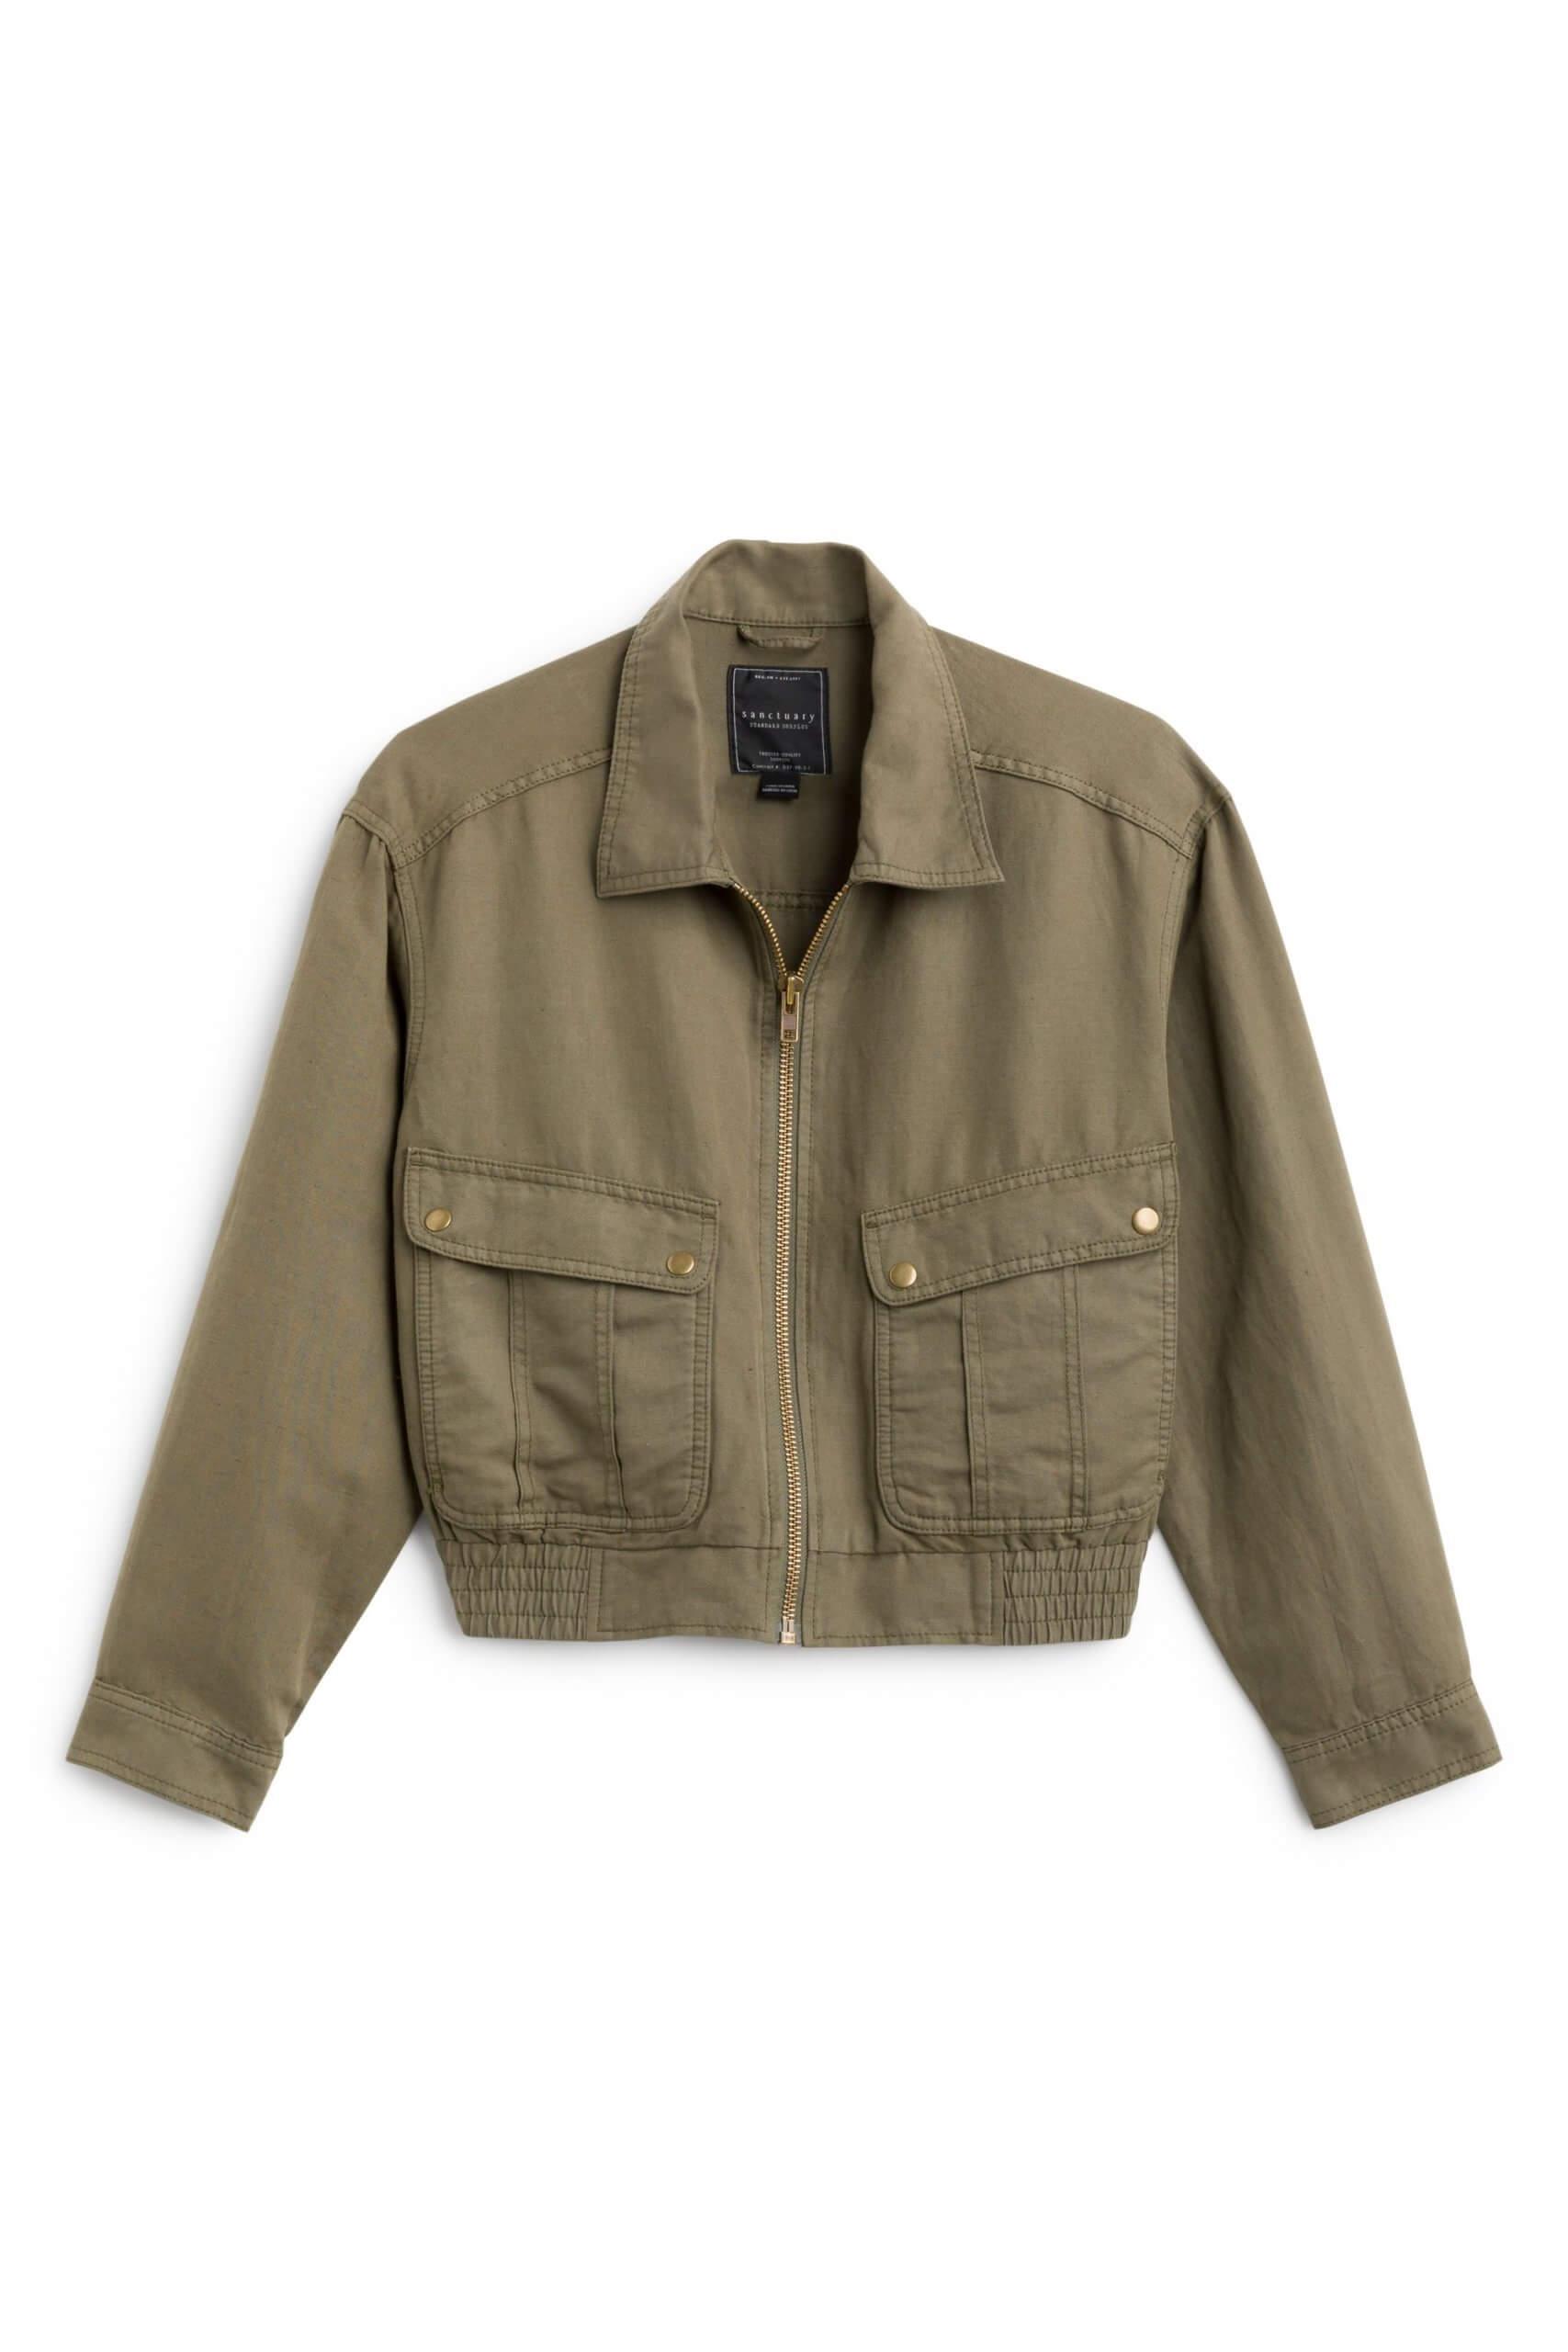 Stitch Fix Women's olive green utility jacket.